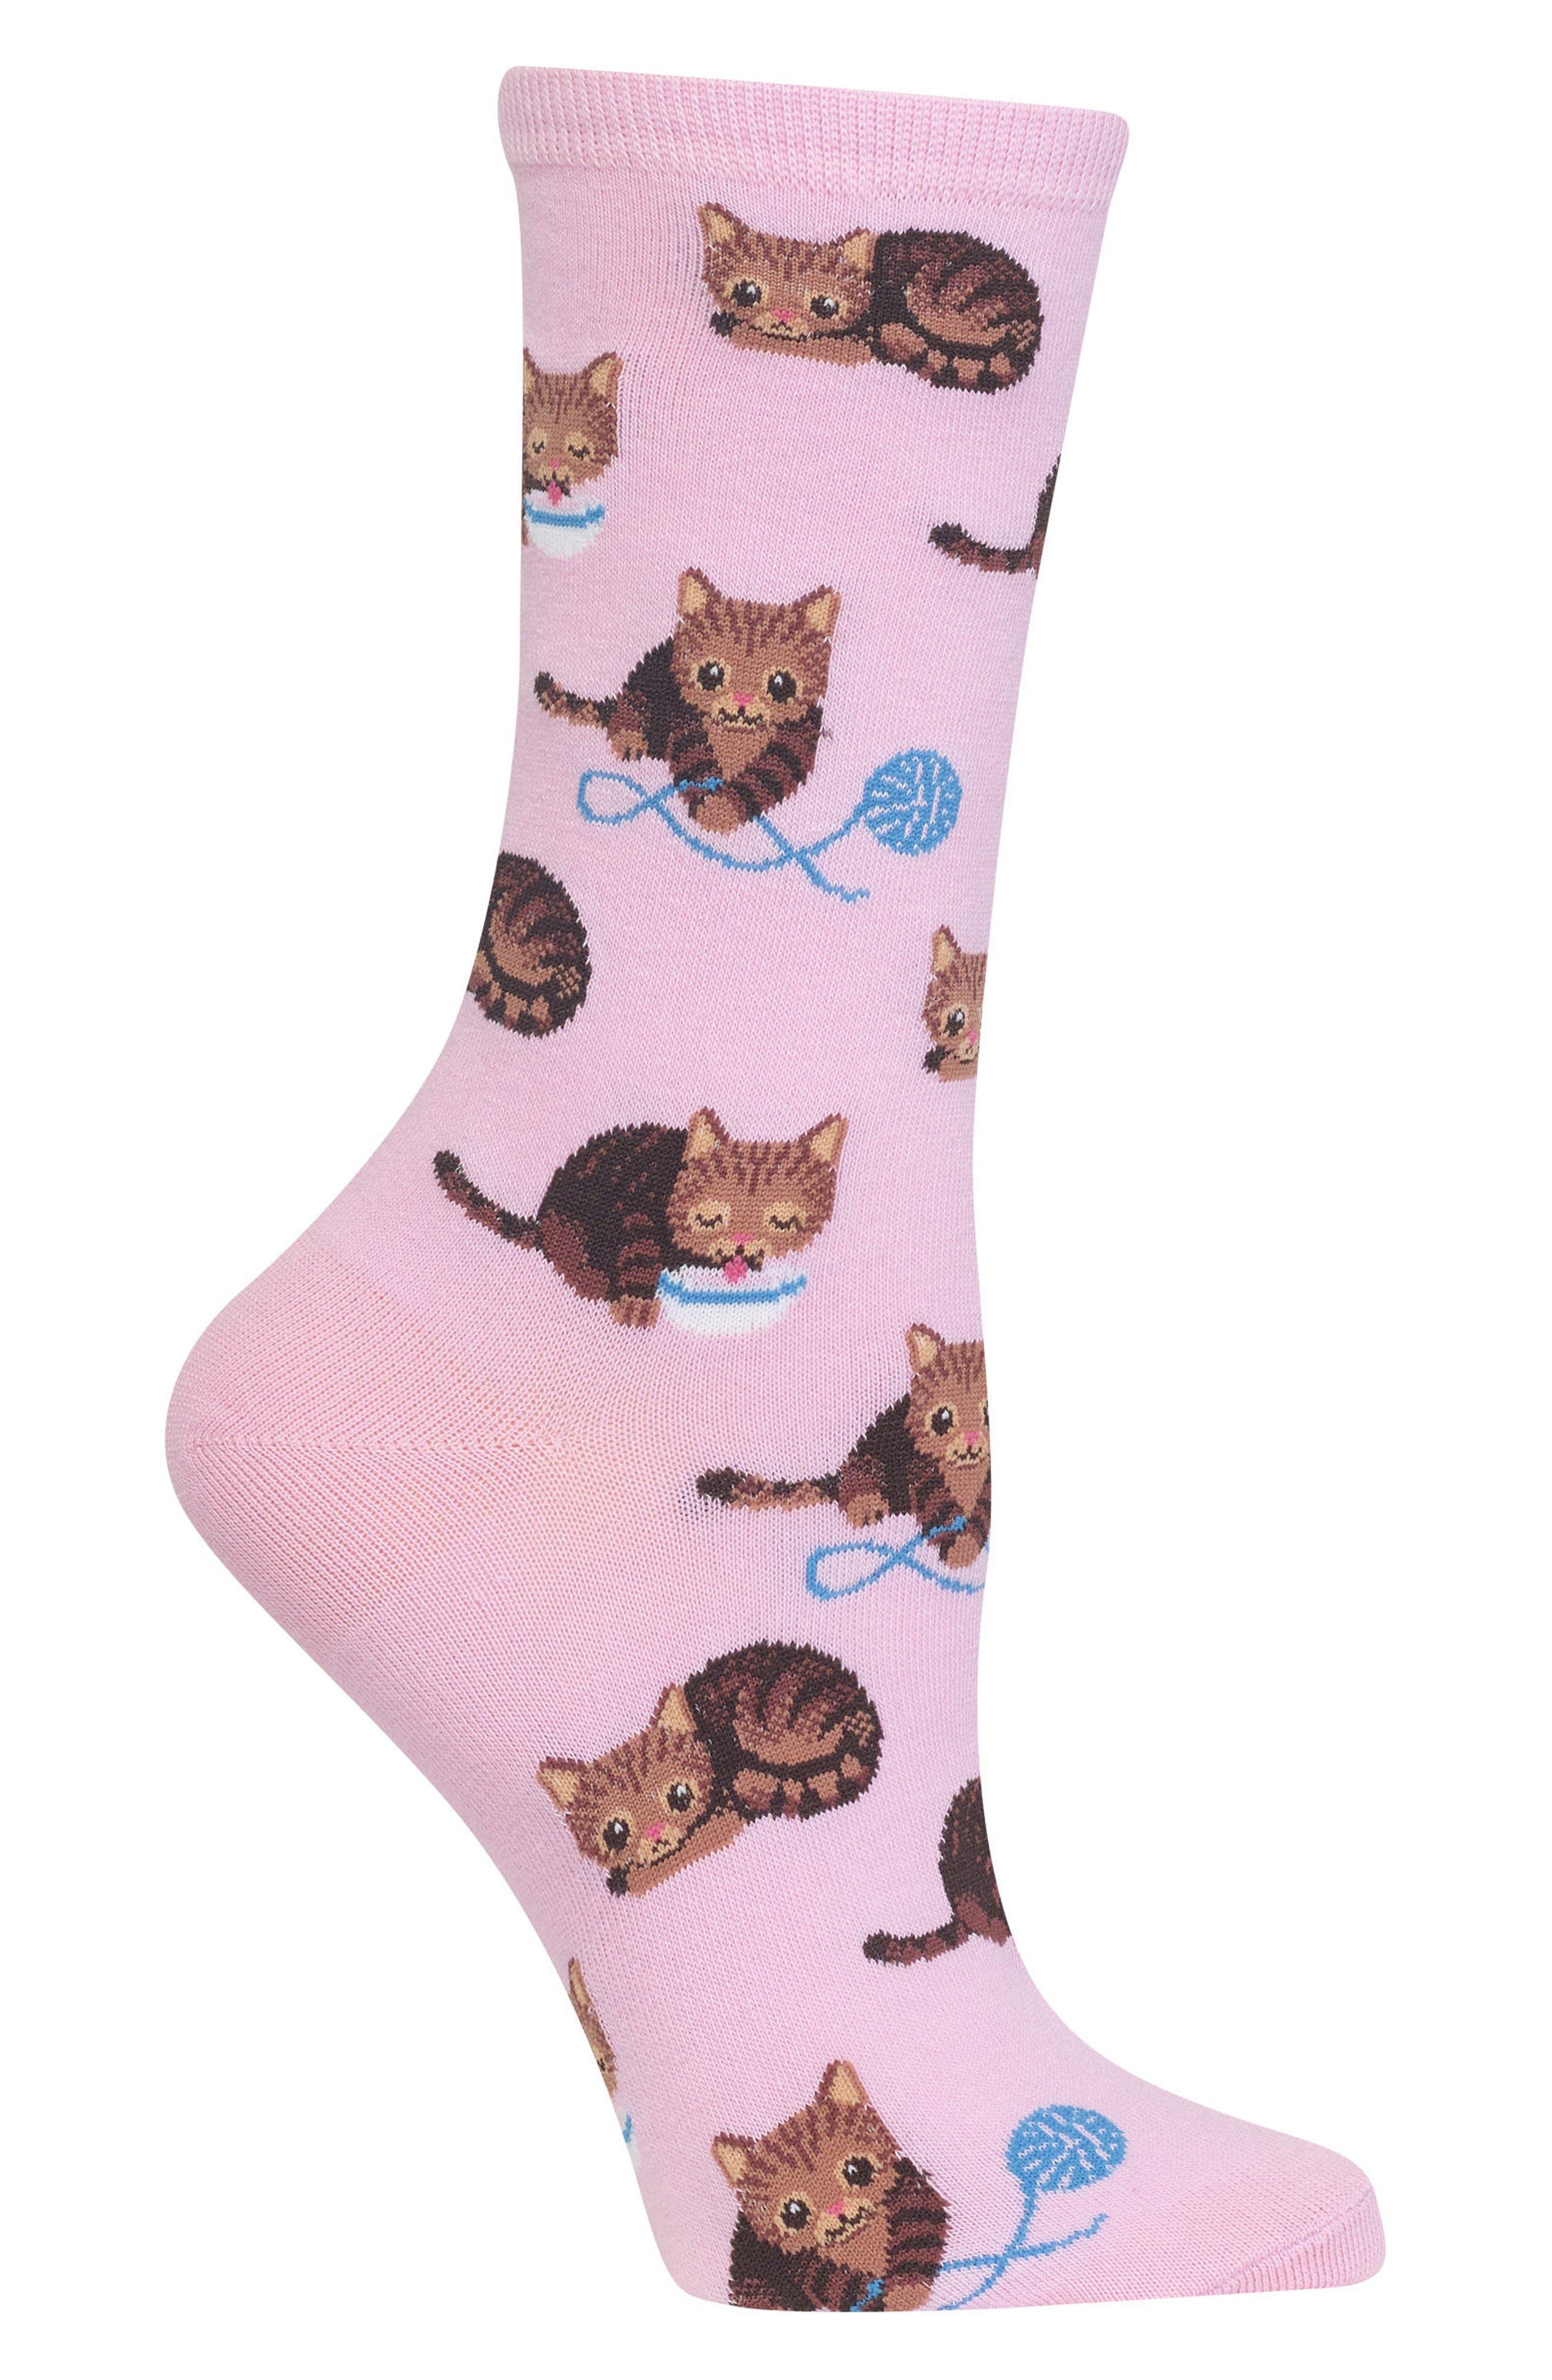 Cat & Yarn Crew Socks,                             Alternate thumbnail 4, color,